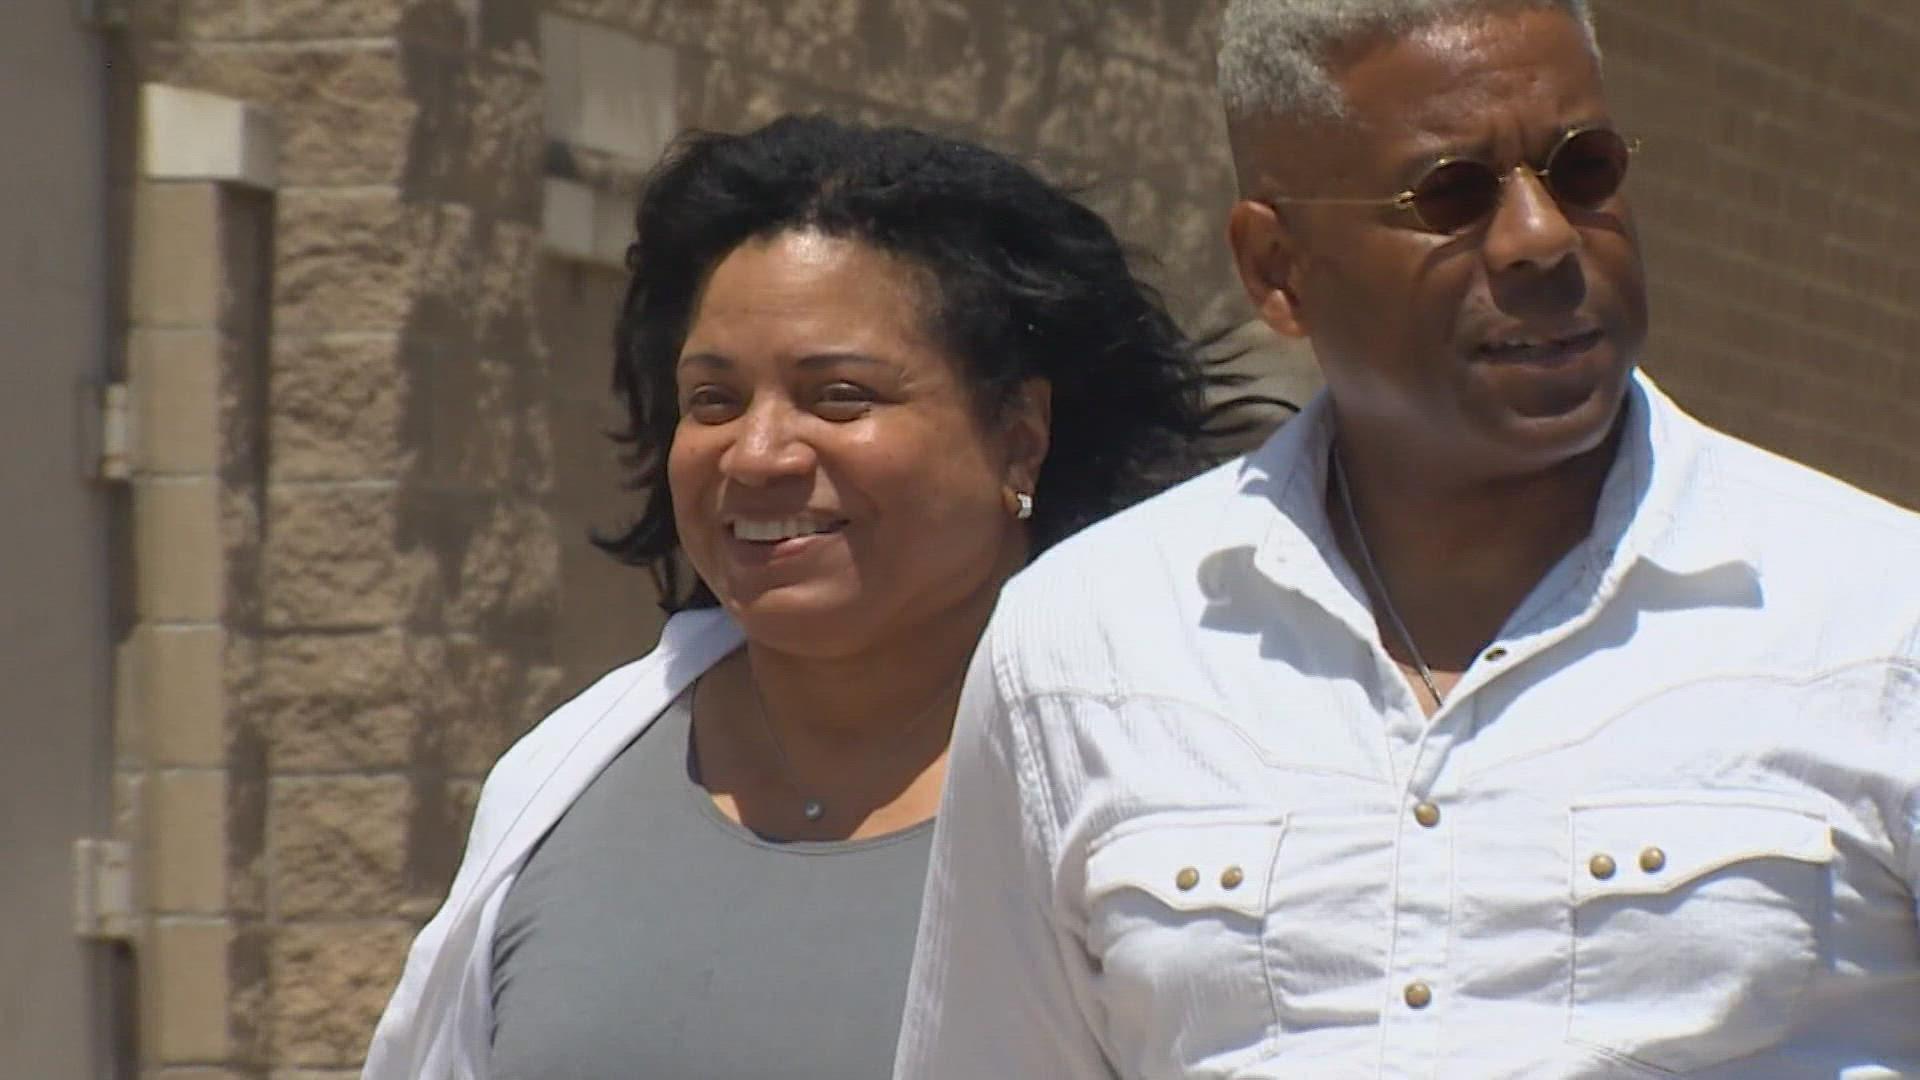 KLIF Morning News: President of Dallas Police Association Discusses Arrest of Angela West, Wife of Gubernatorial Candidate Allen West